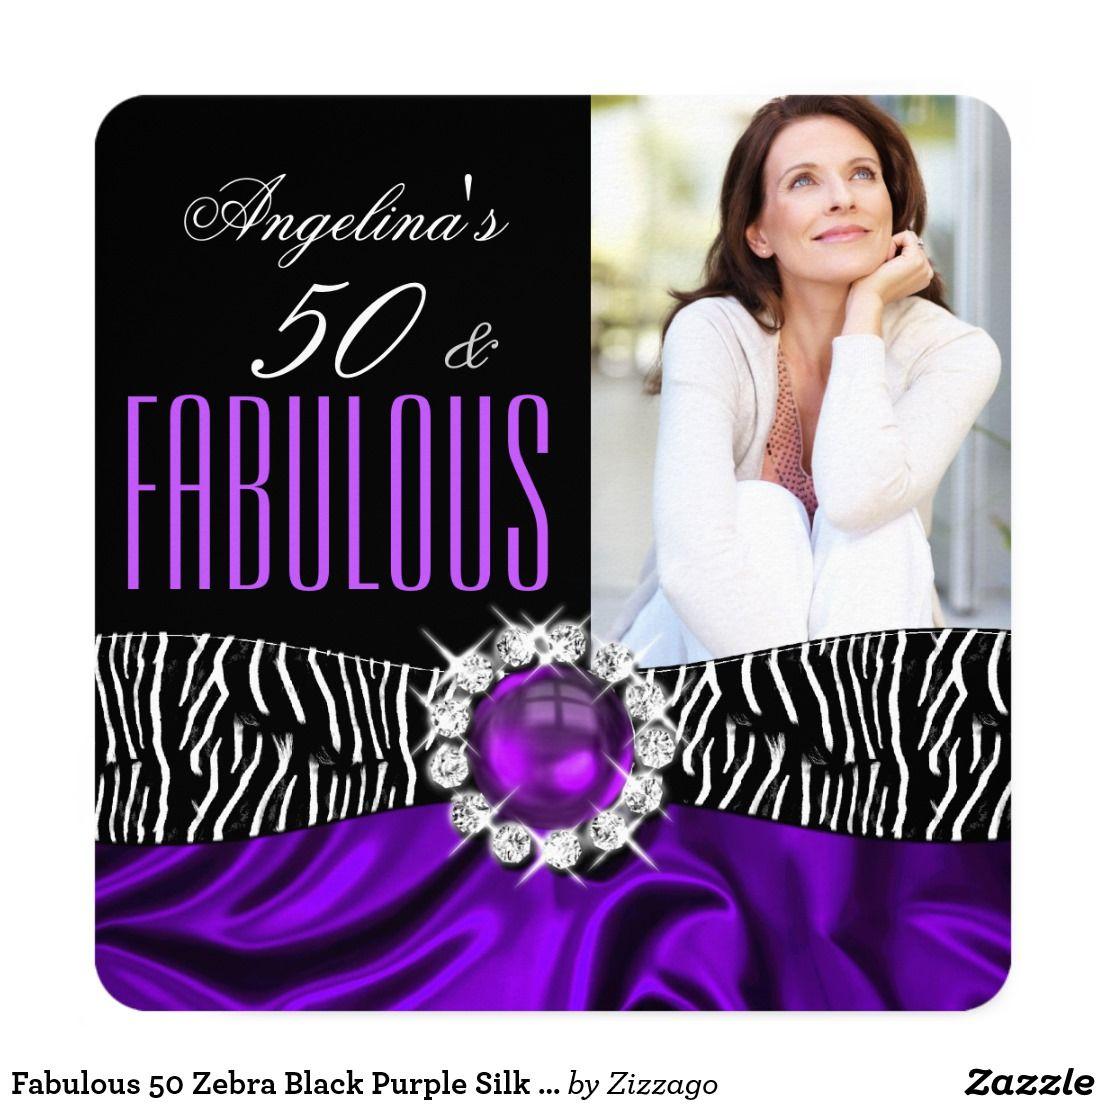 Fabulous 50 Zebra Black Purple Silk Birthday 2 Card 50th birthday